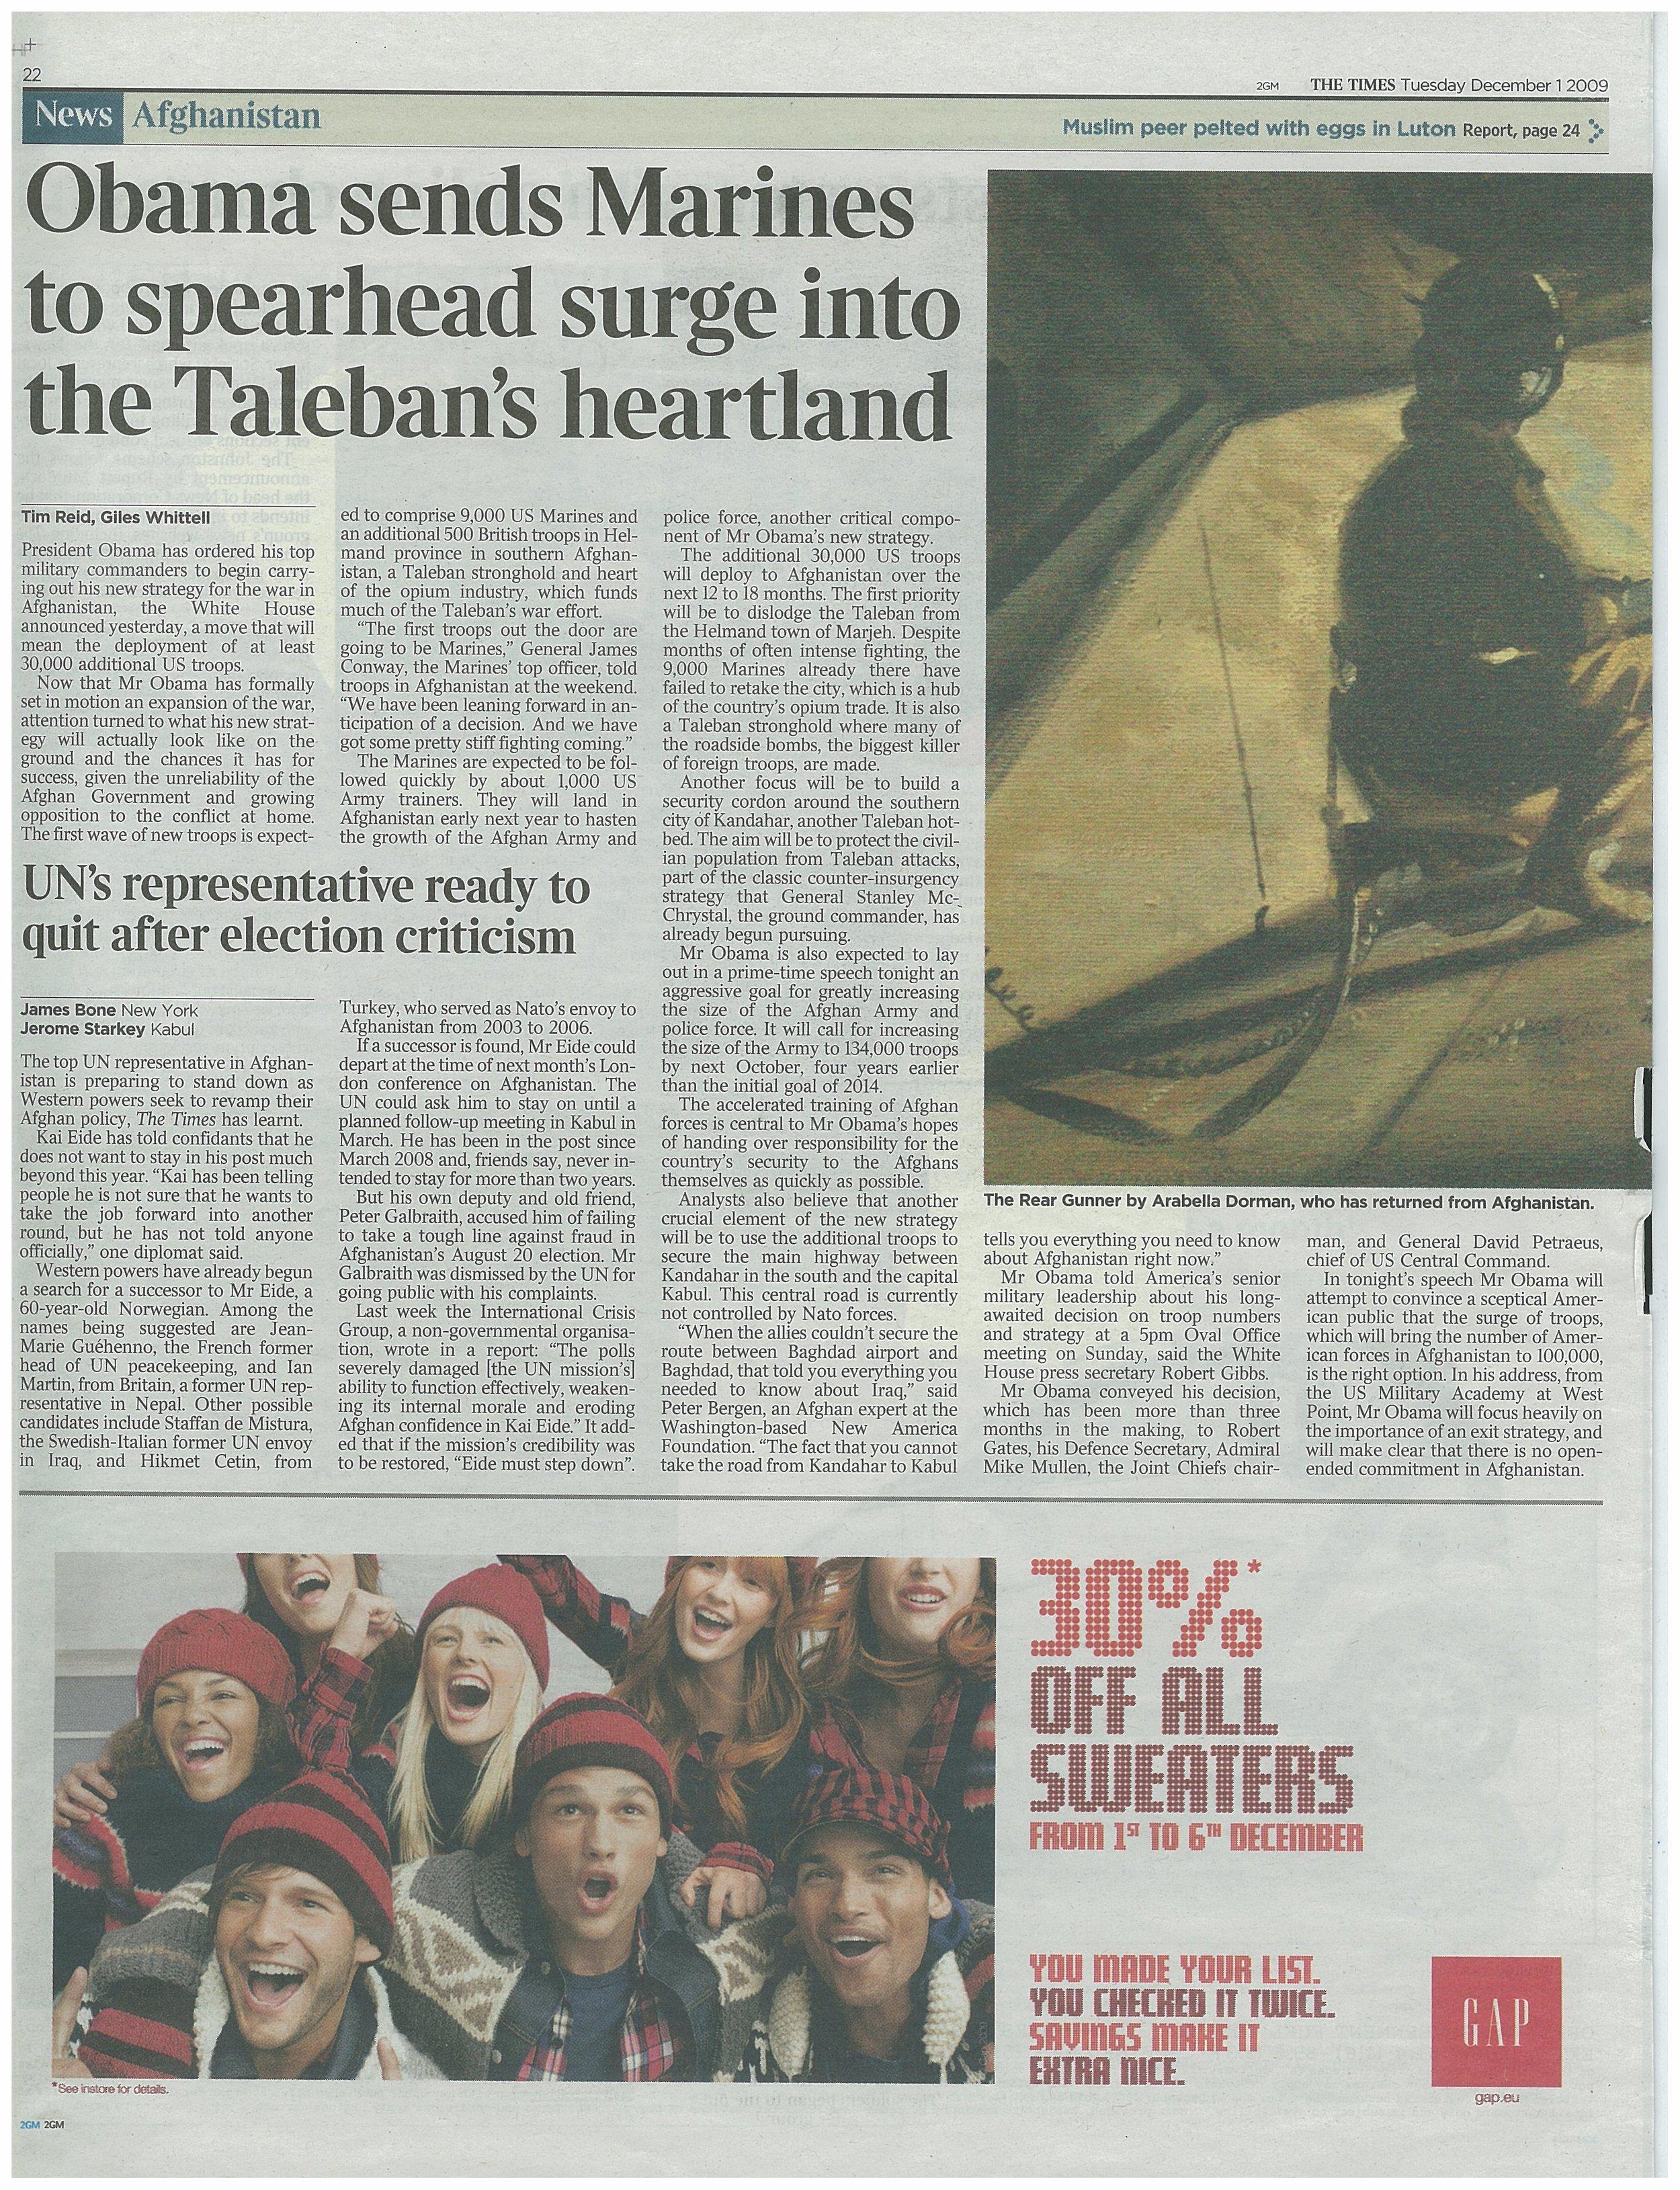 The Times II, December 1 2009.jpg